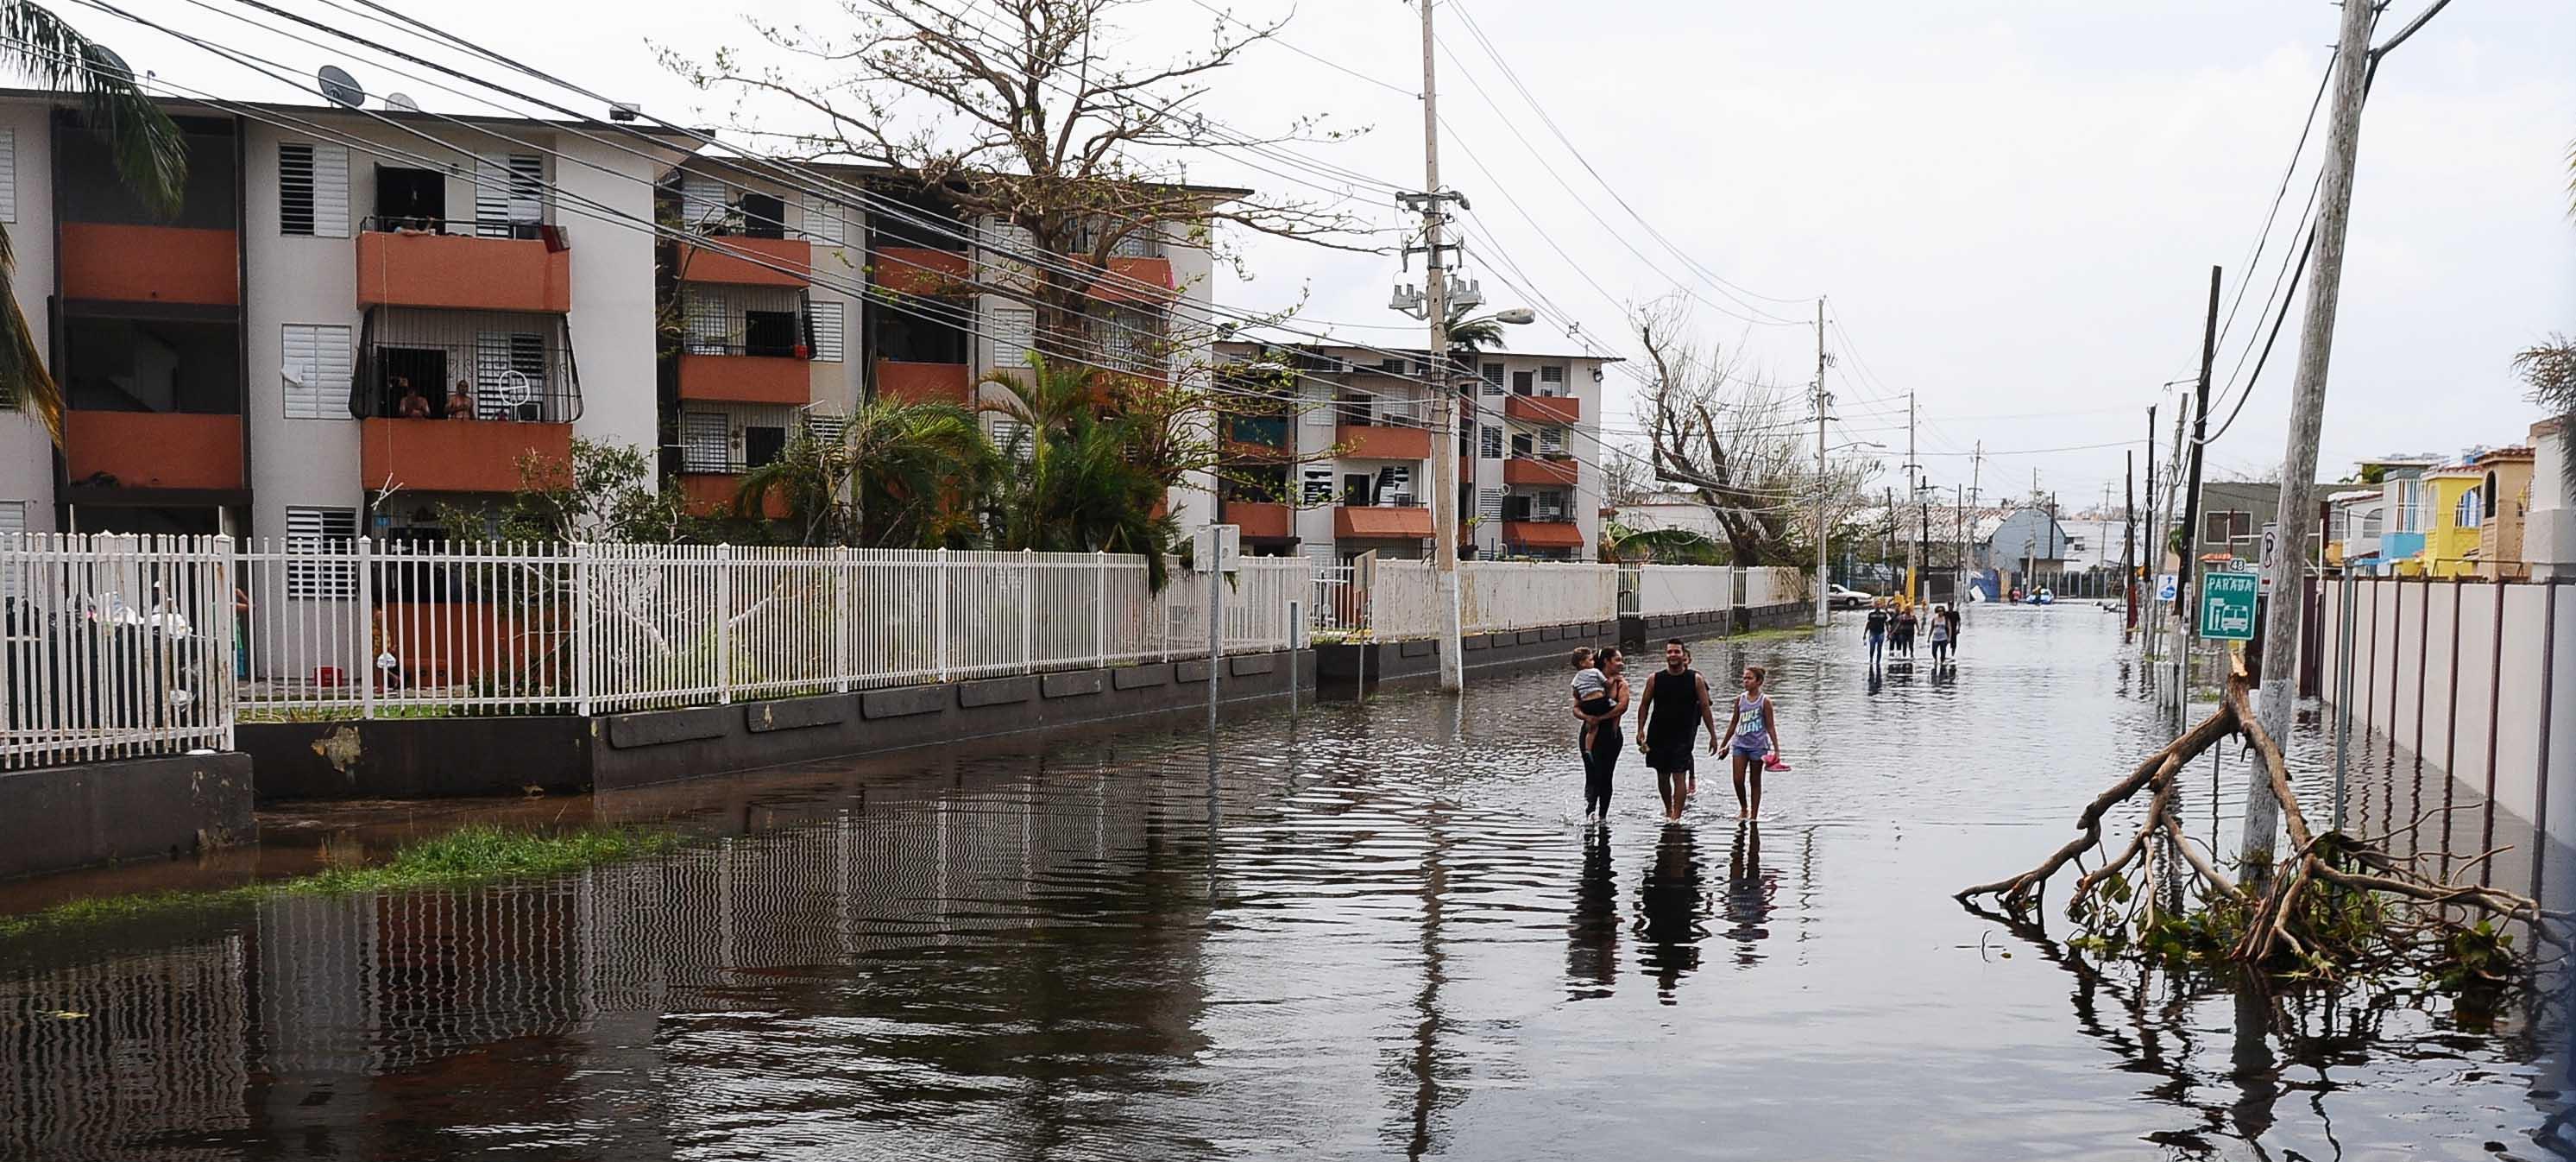 My uncle survived Hurricane Maria. Despair over its devastation killed him.